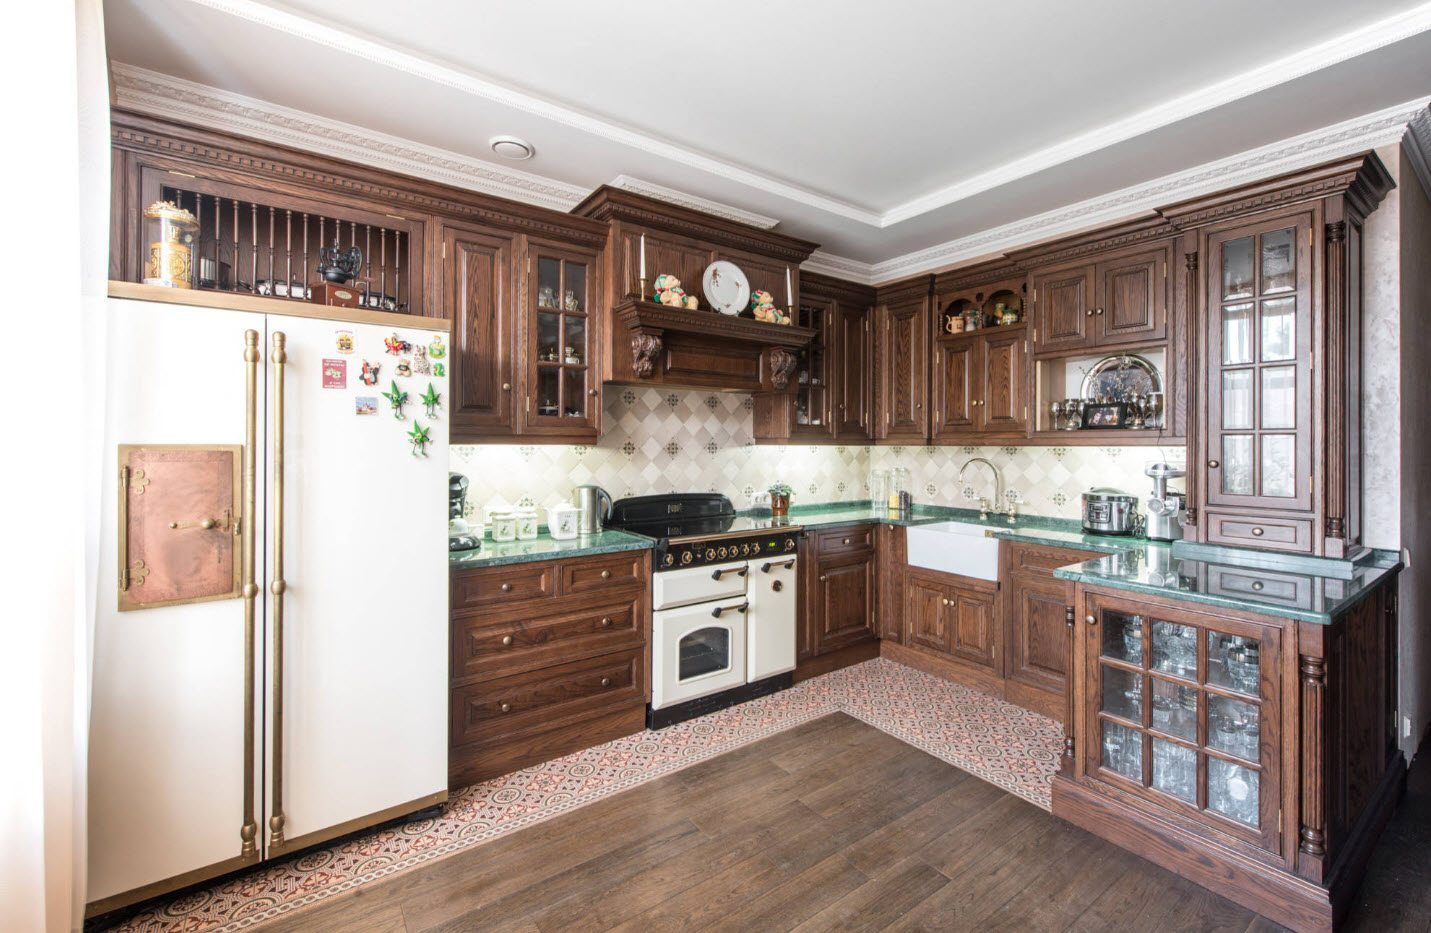 Dark wooden kitchen furniture with white facades of the appliances